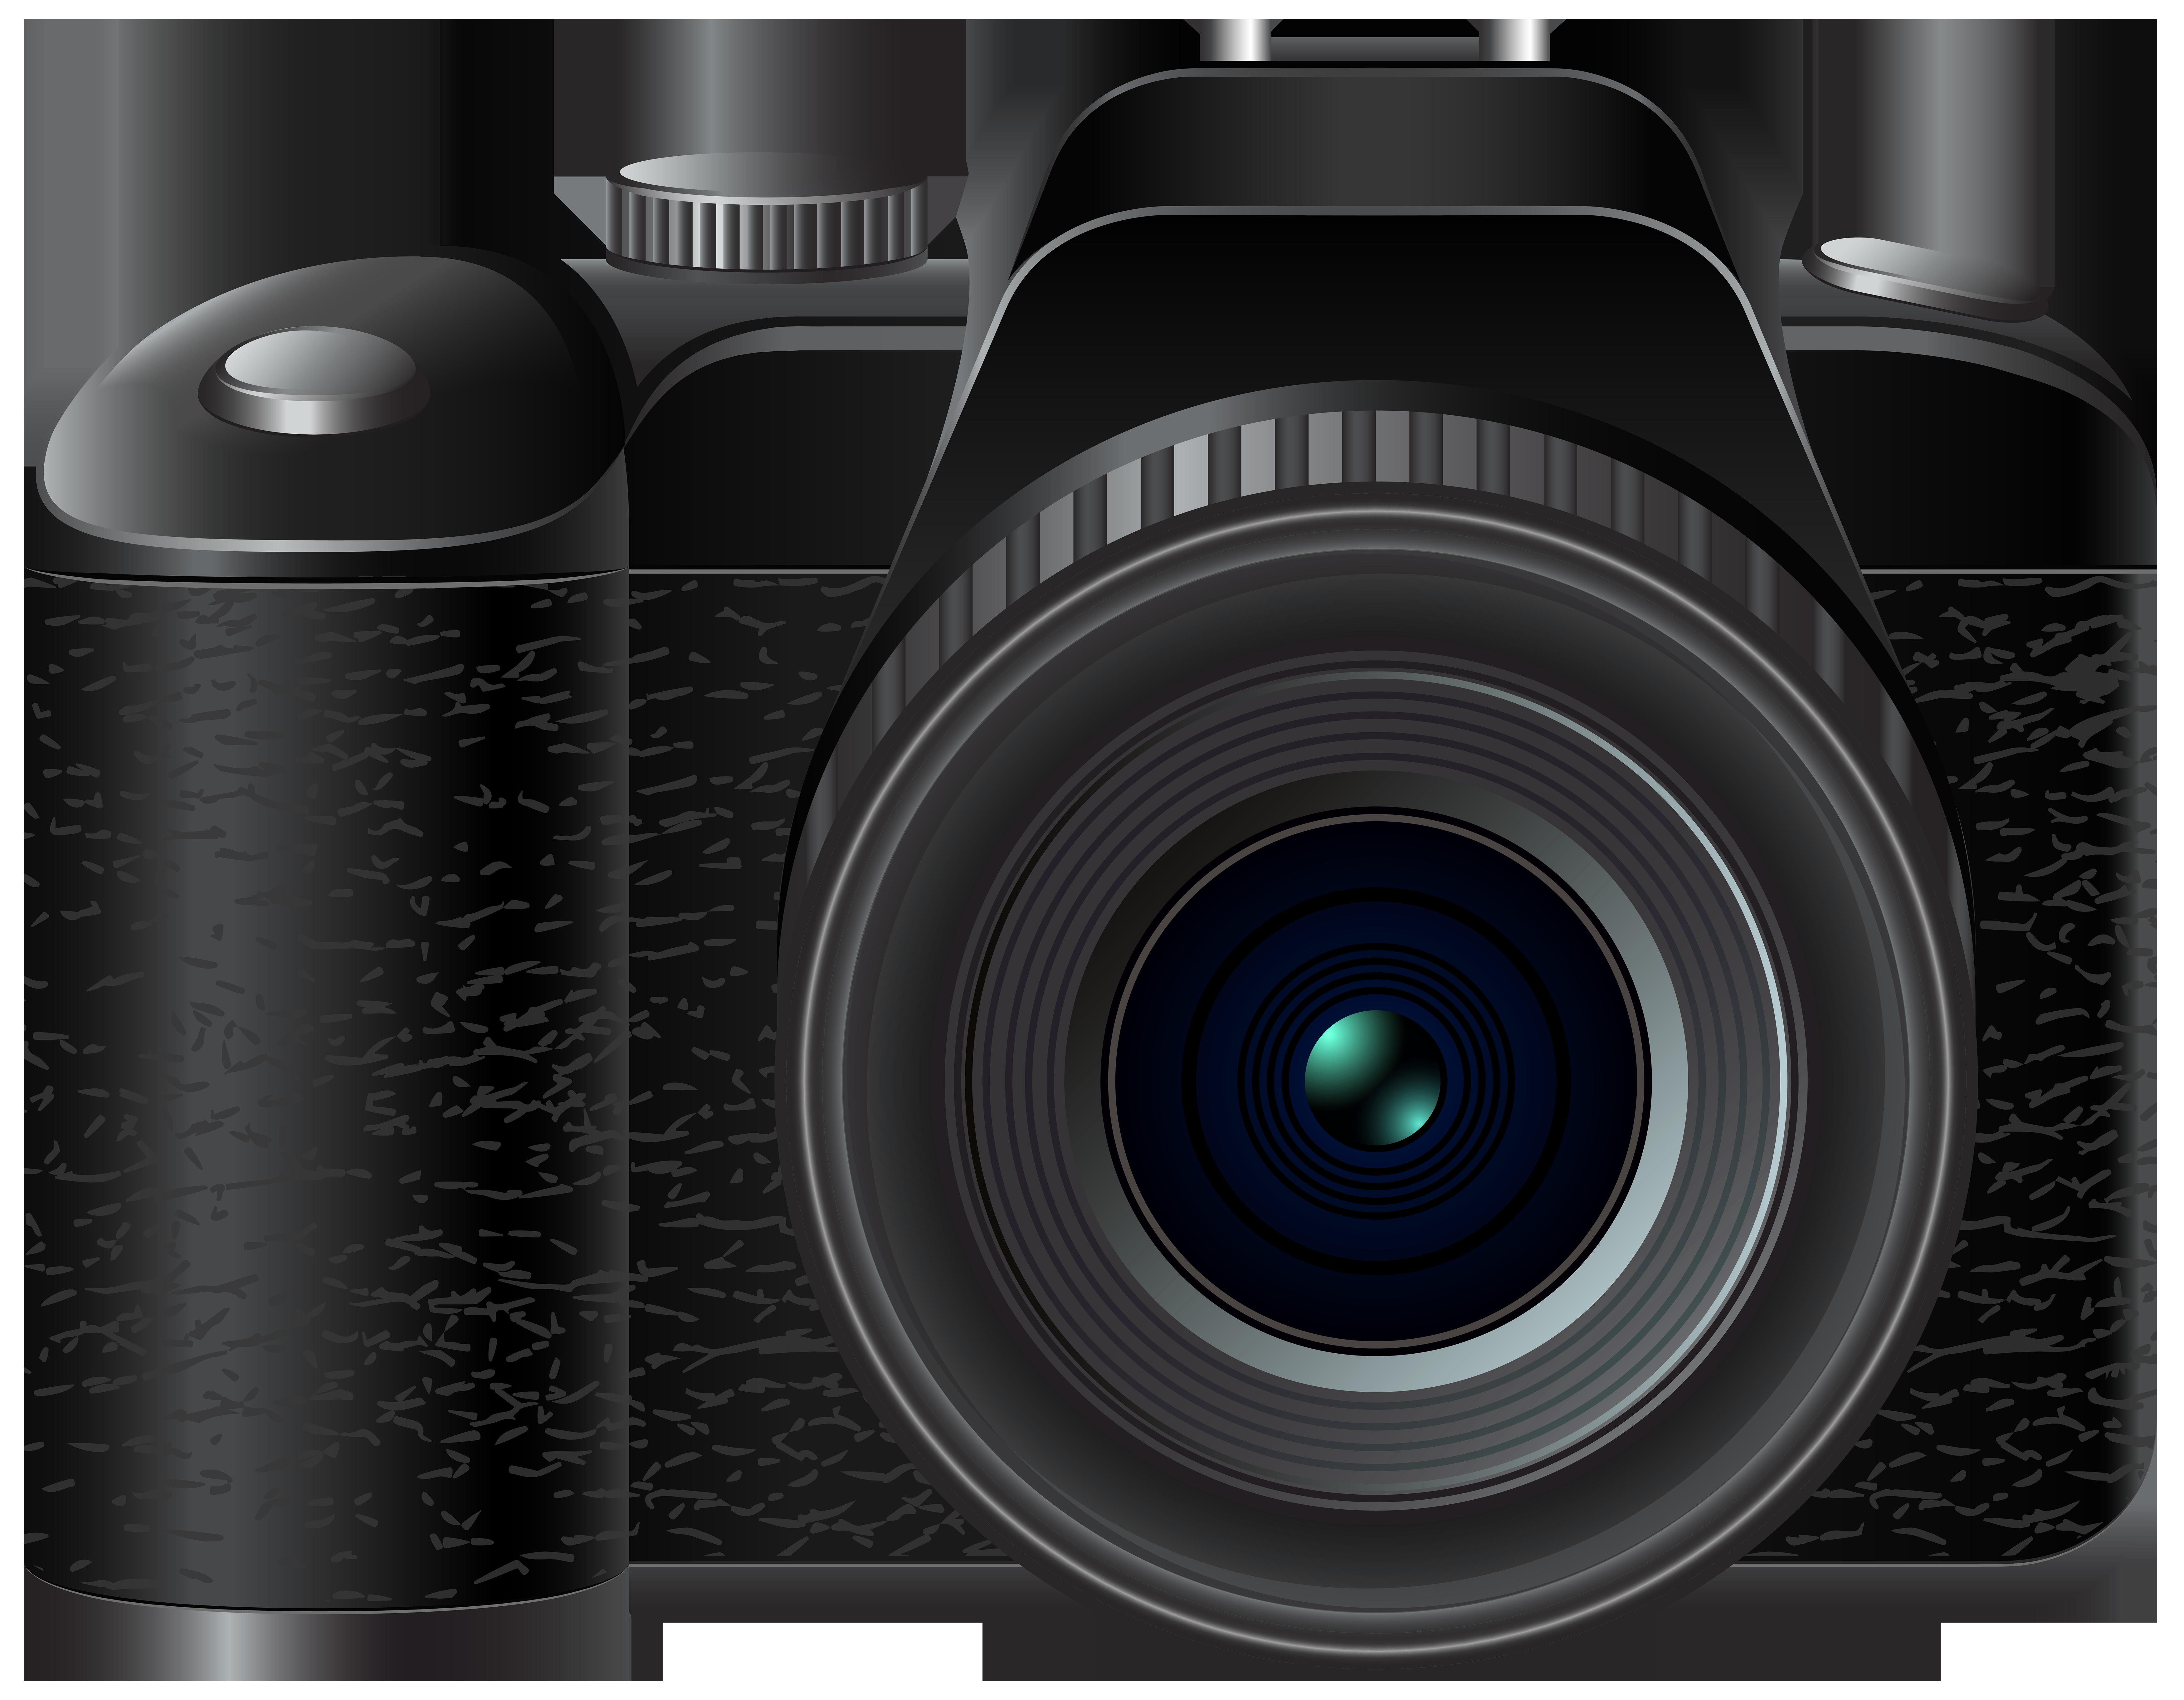 DSLR Camera Transparent Background Vector Vector, Clipart, PSD.